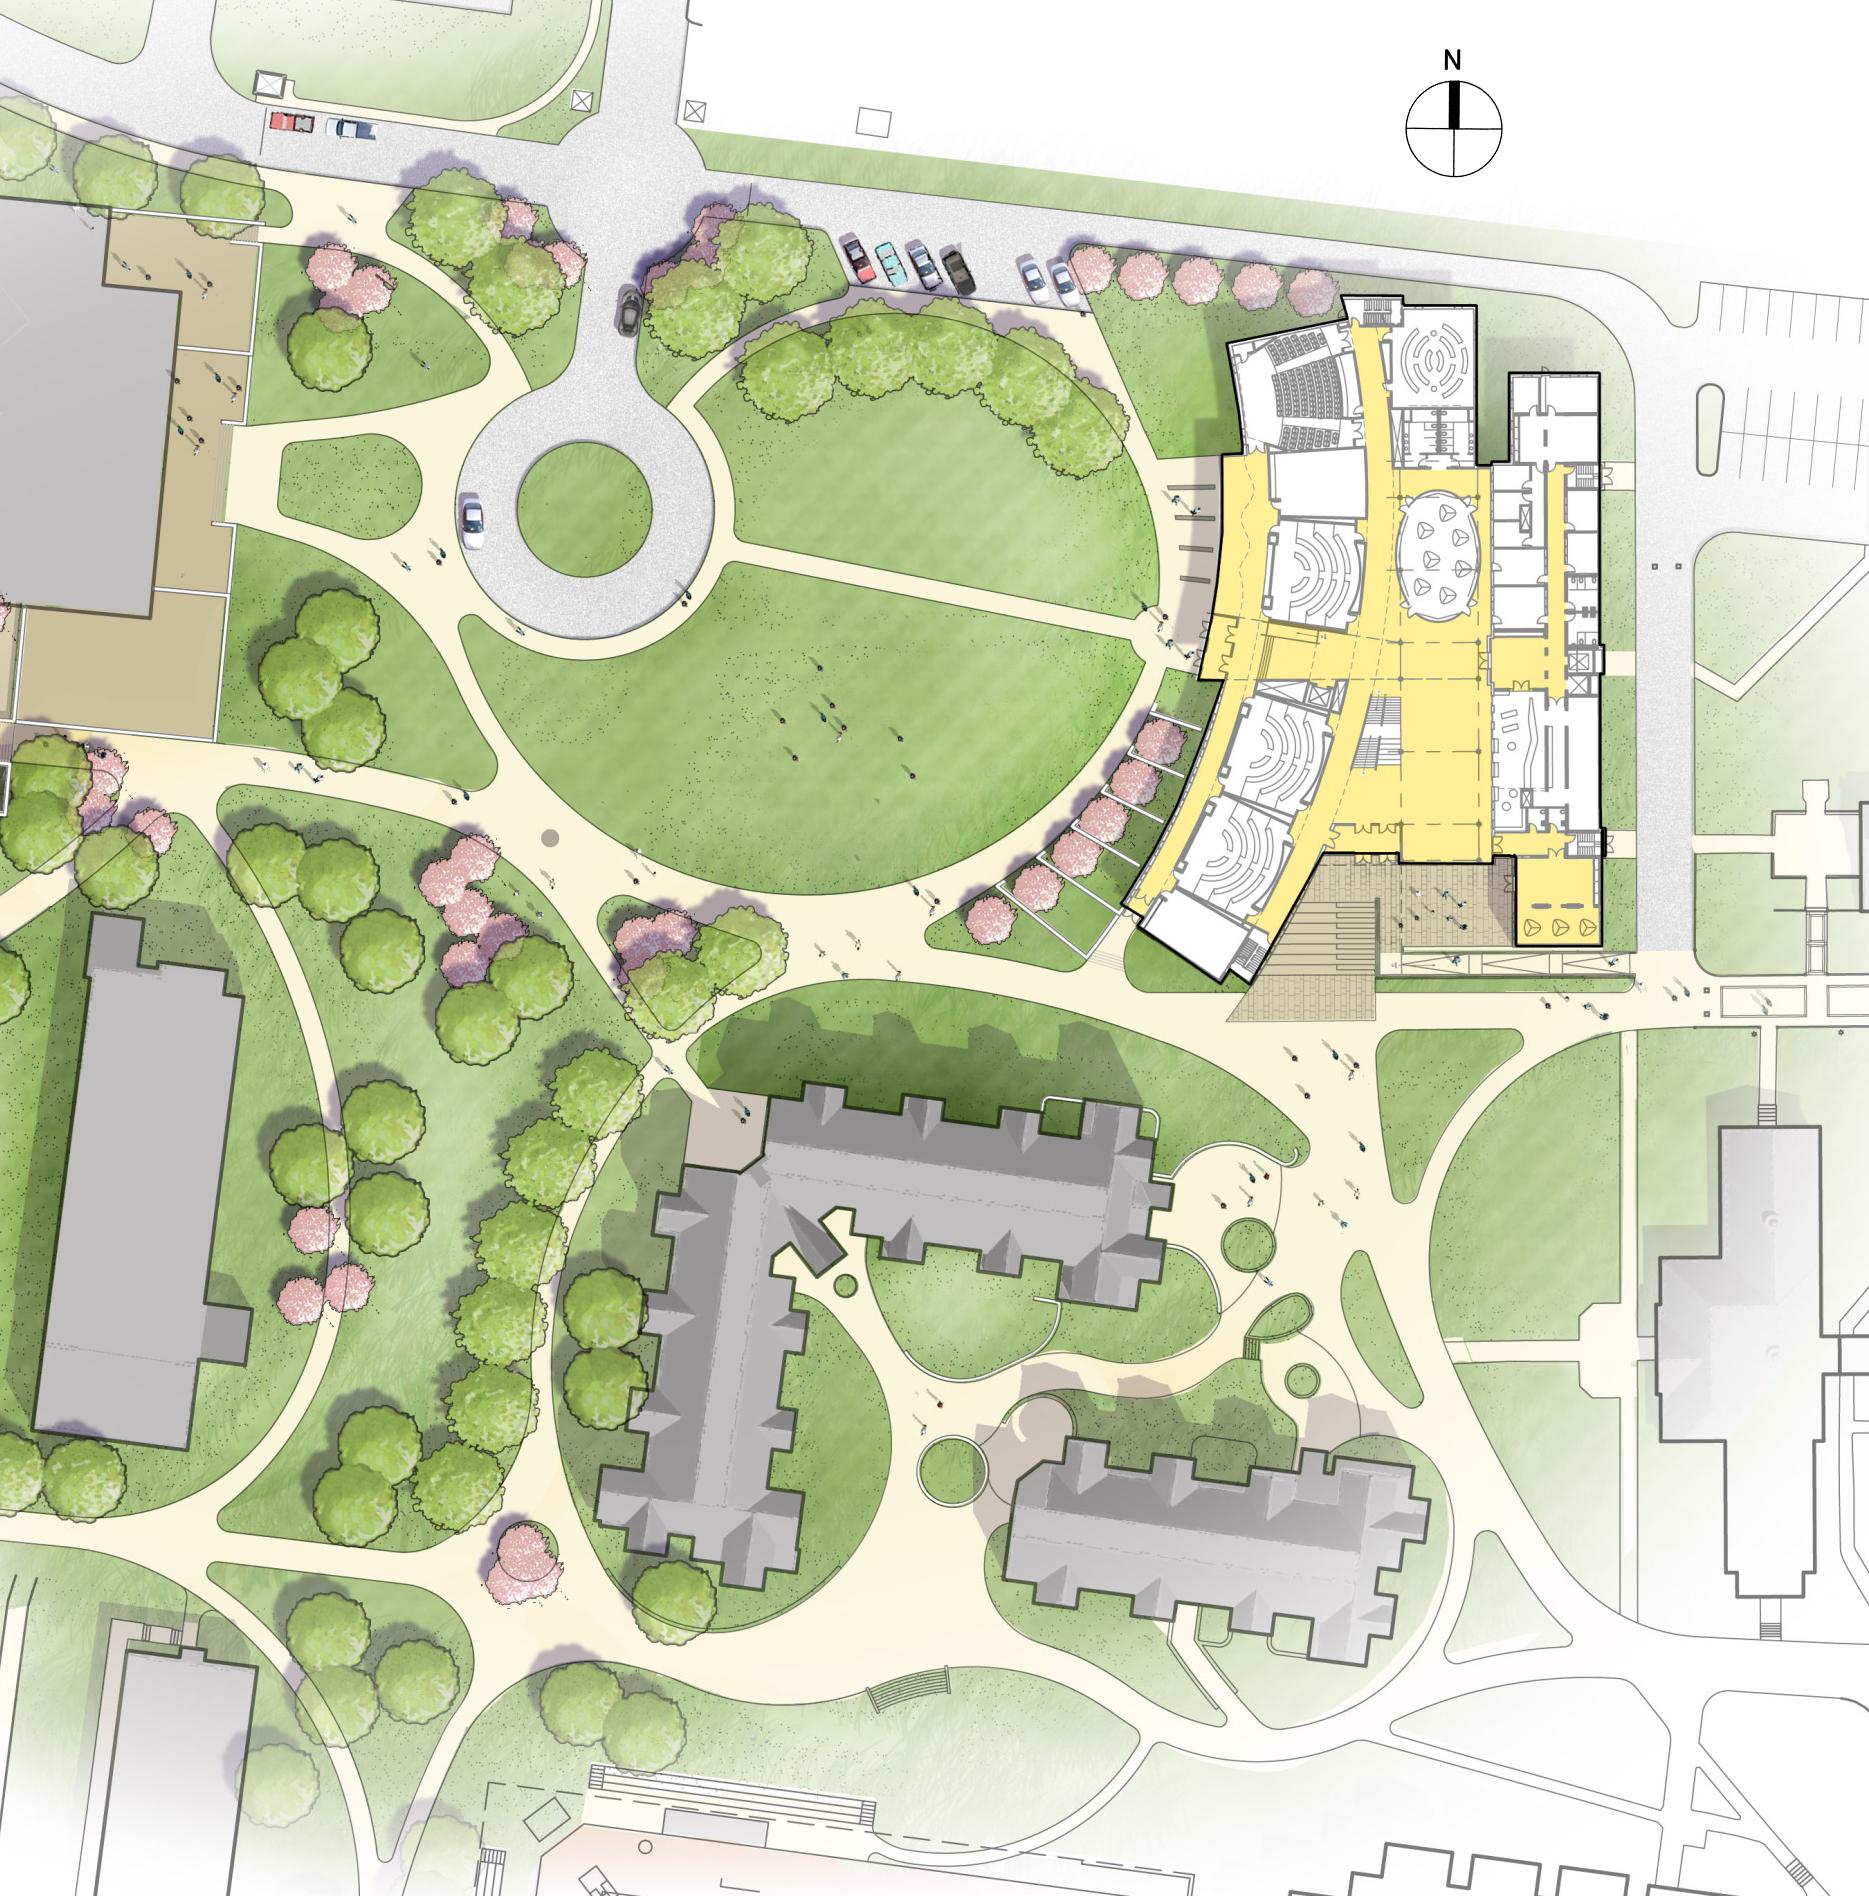 Site plan for renovation